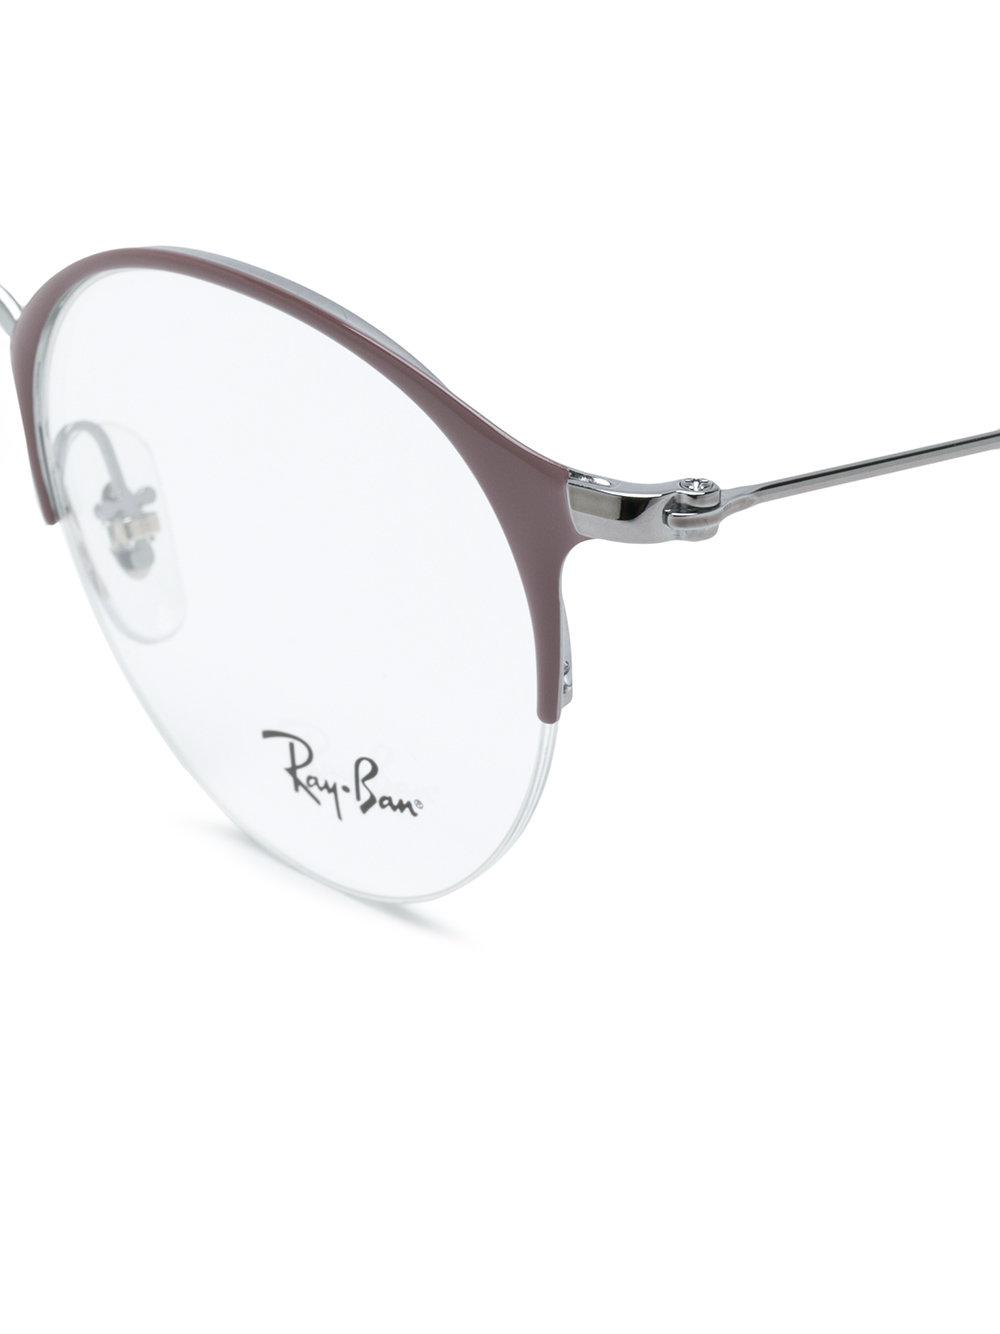 Ray-Ban Round-frame Half-rim Glasses - Lyst